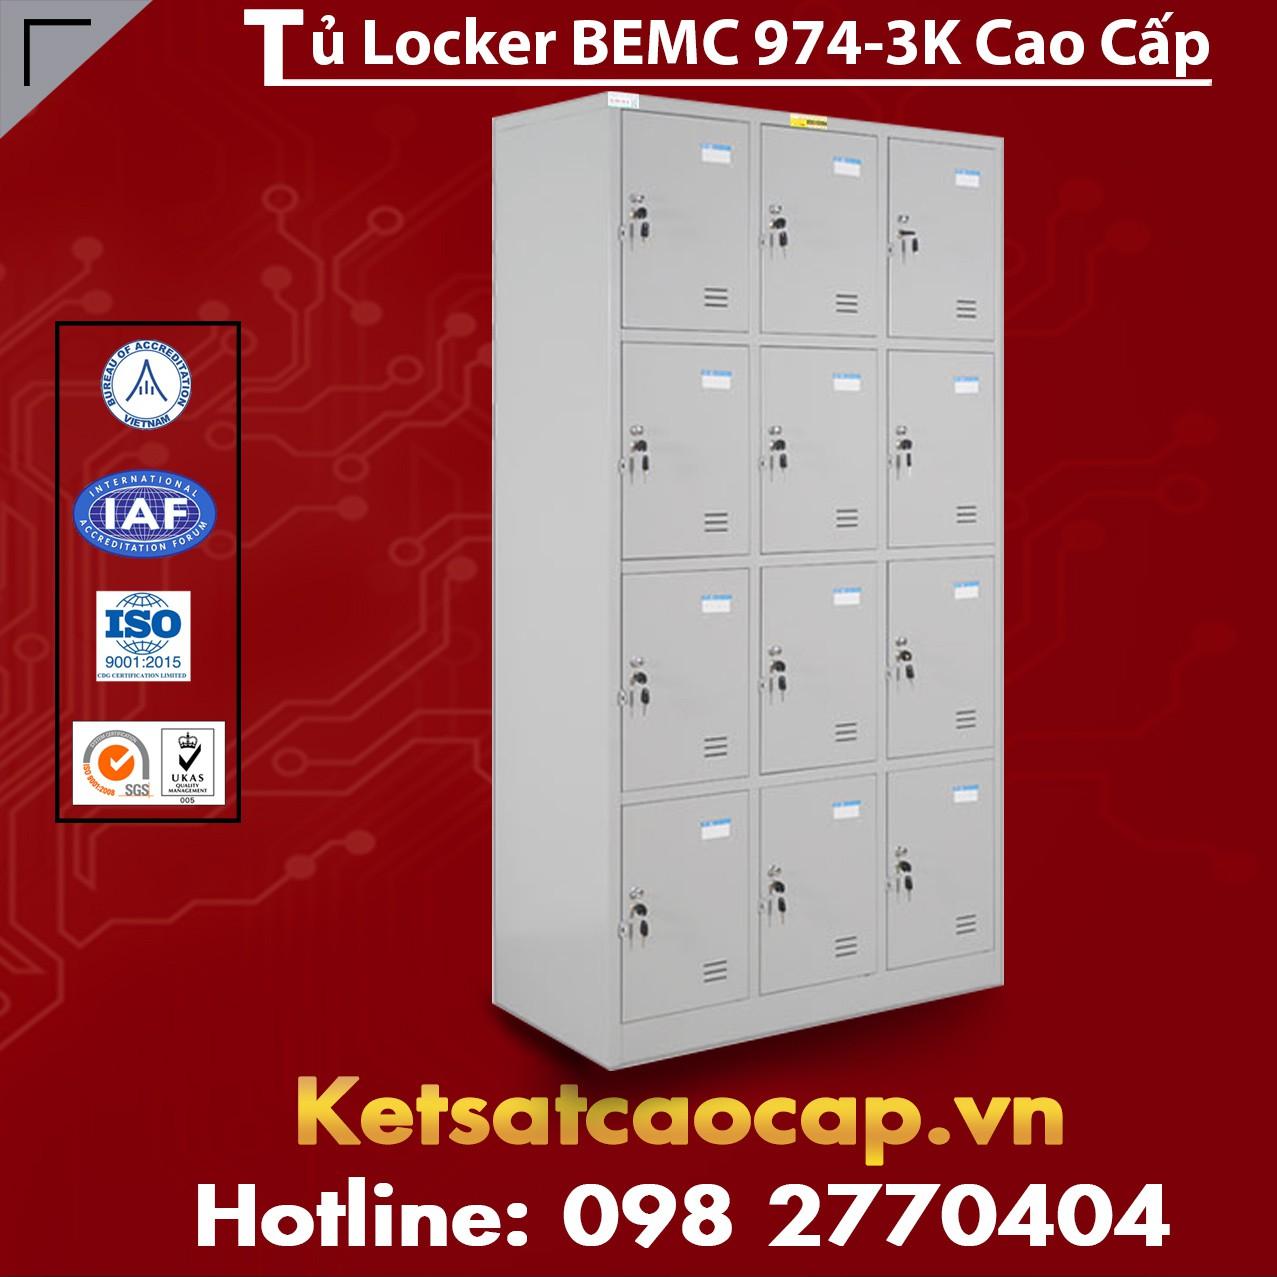 Tủ Locker BEMC 974-3K